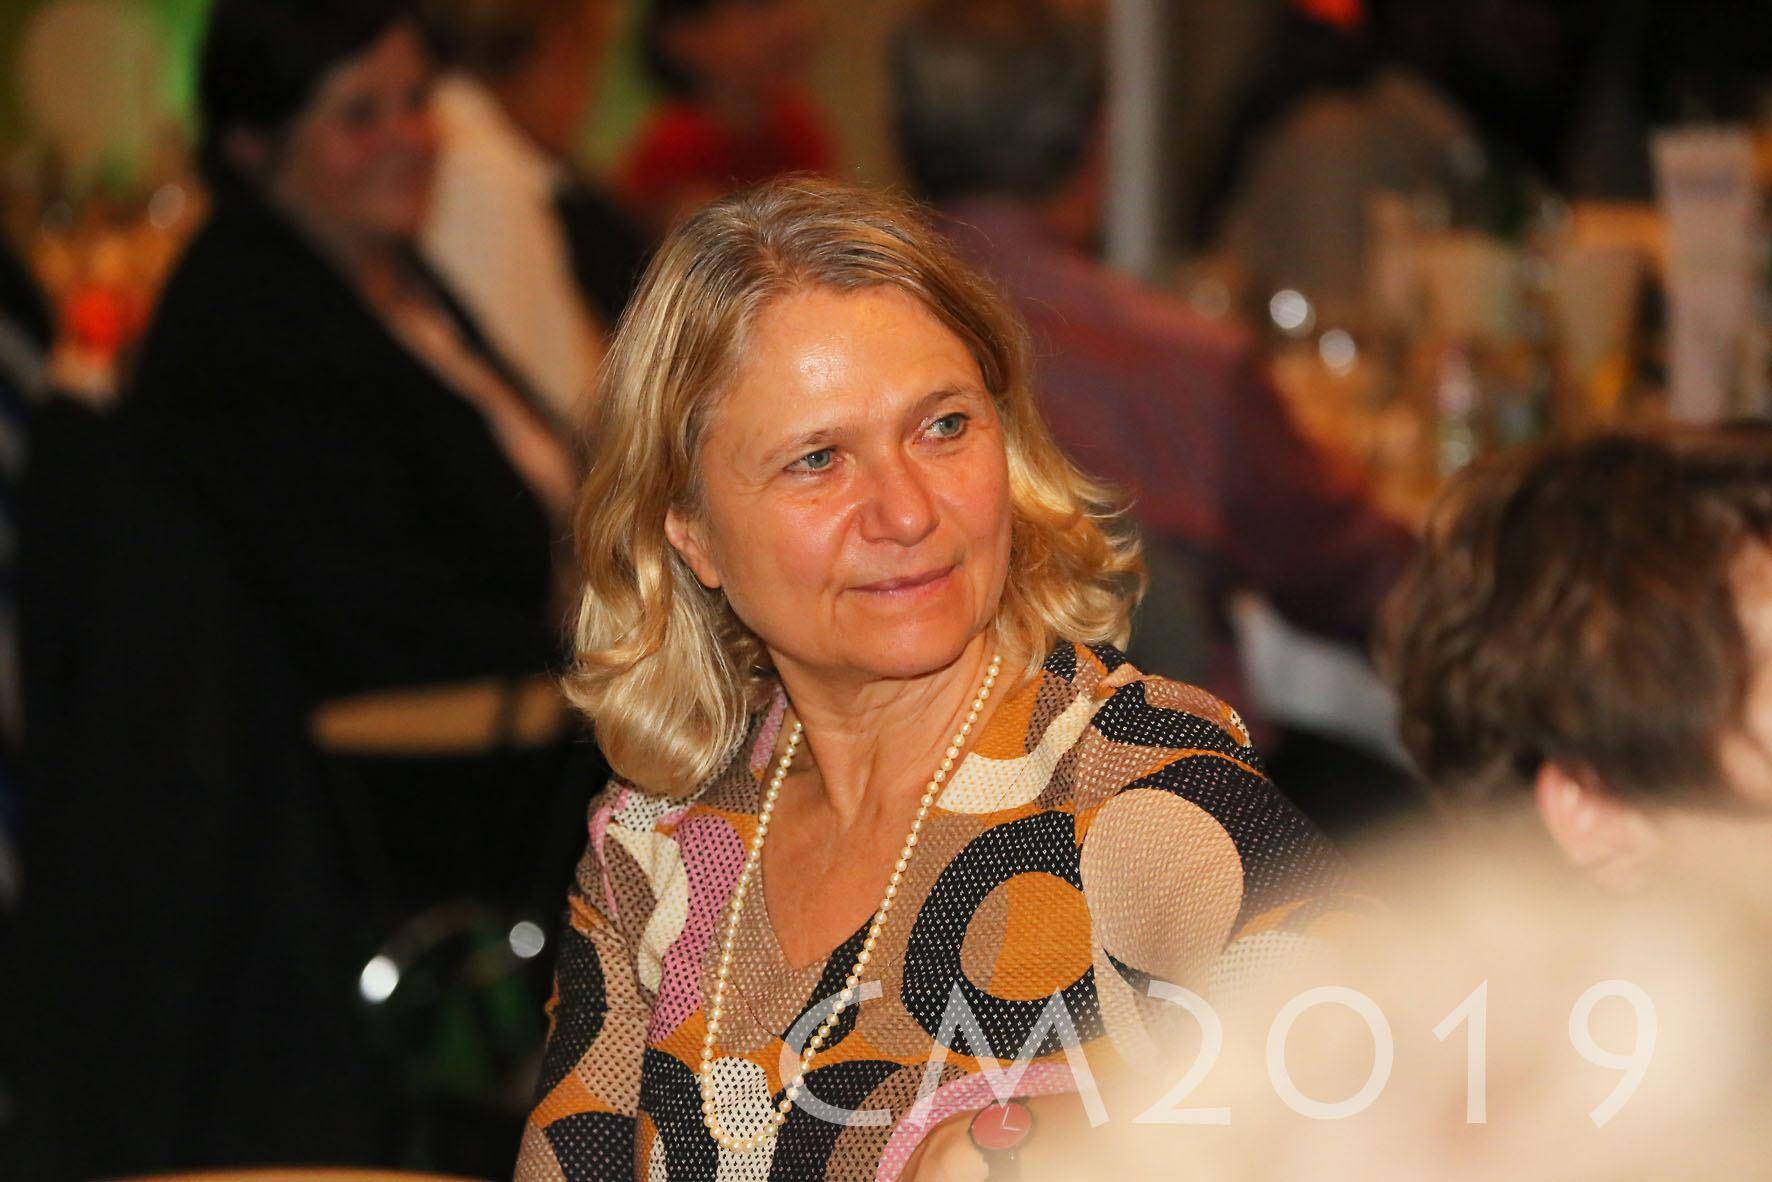 Magnat Sportgala 2019, Ursula Sowa, Autor: Charlotte Moser